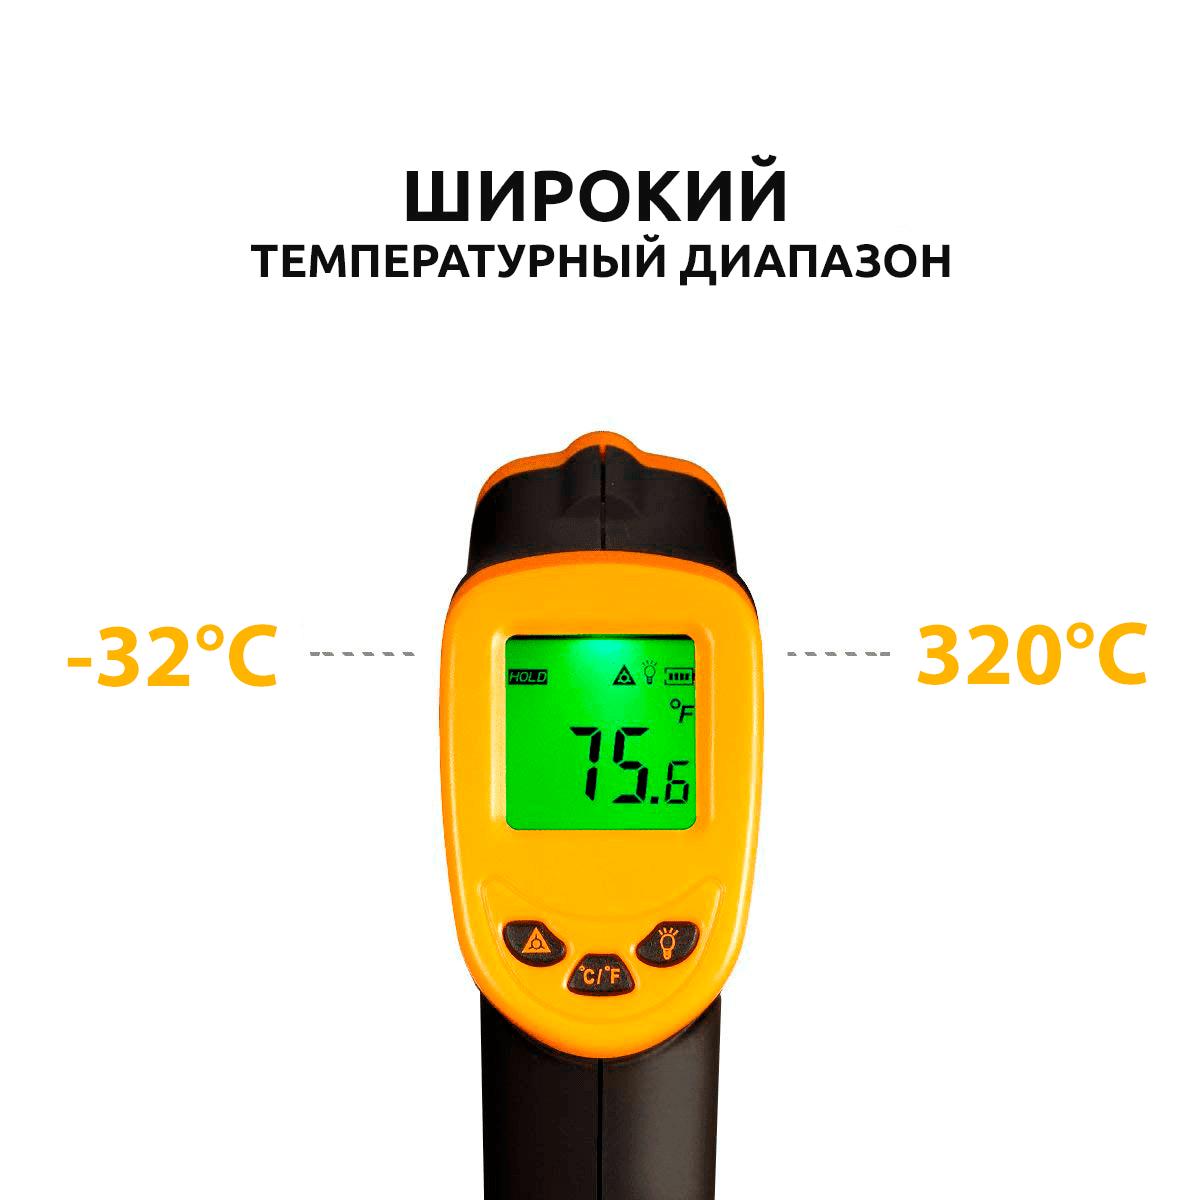 Диапазон температур пирометра AMTAST AMT320